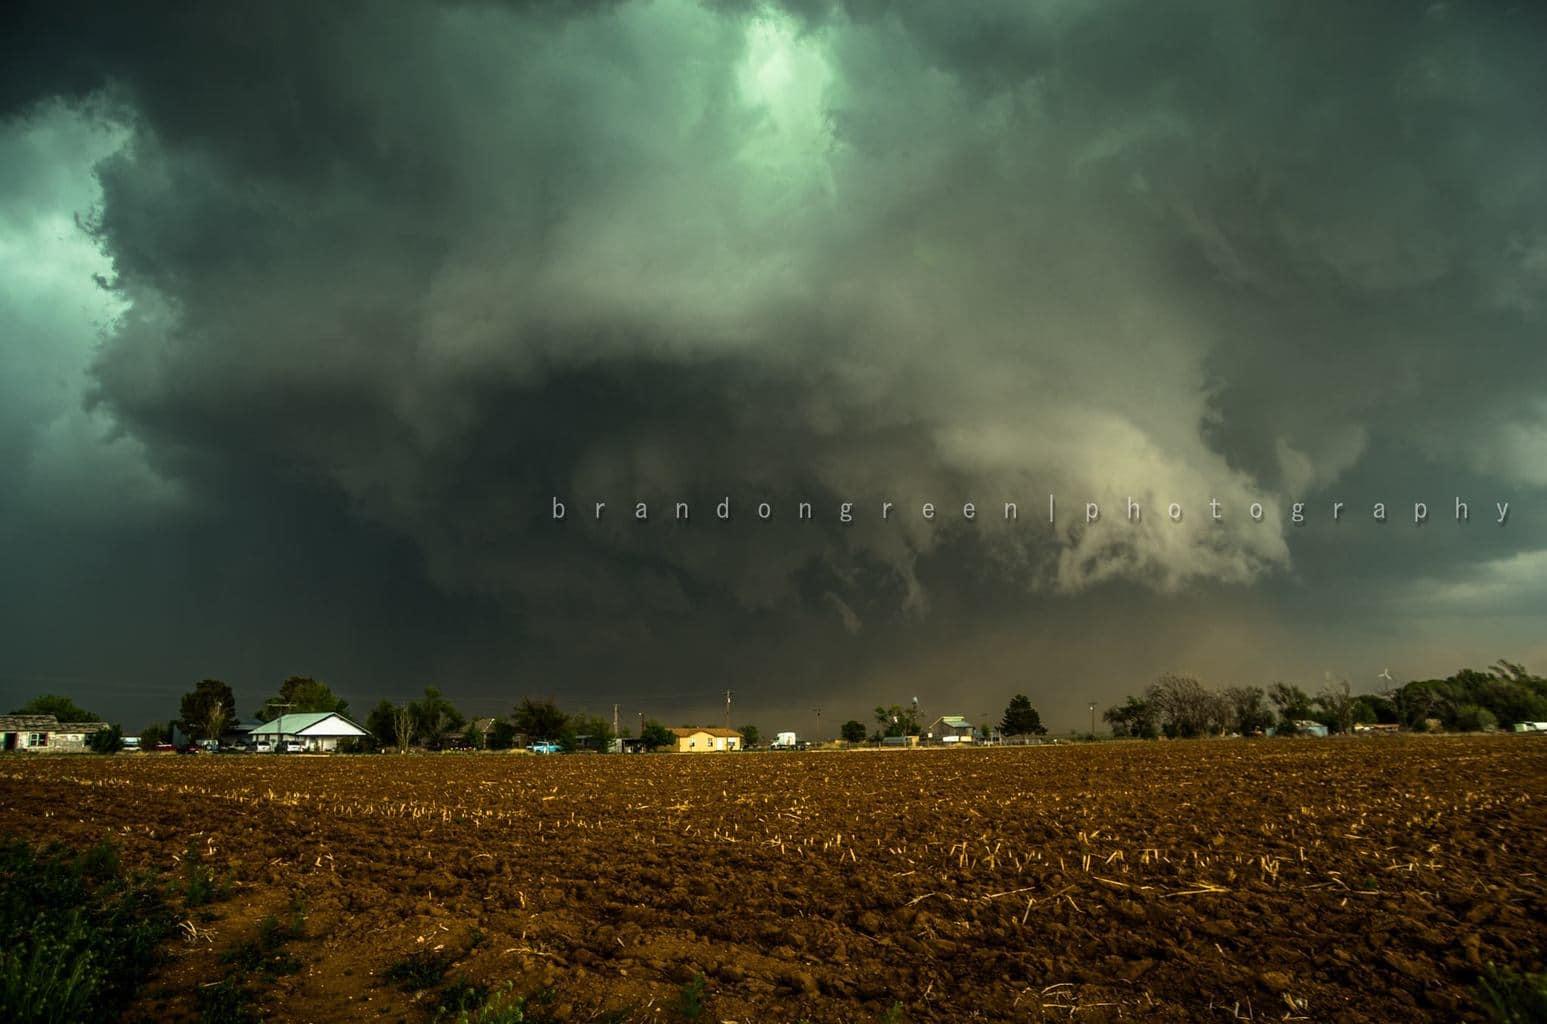 Tornado warned spinning beast over Hereford, TX 04-22-15